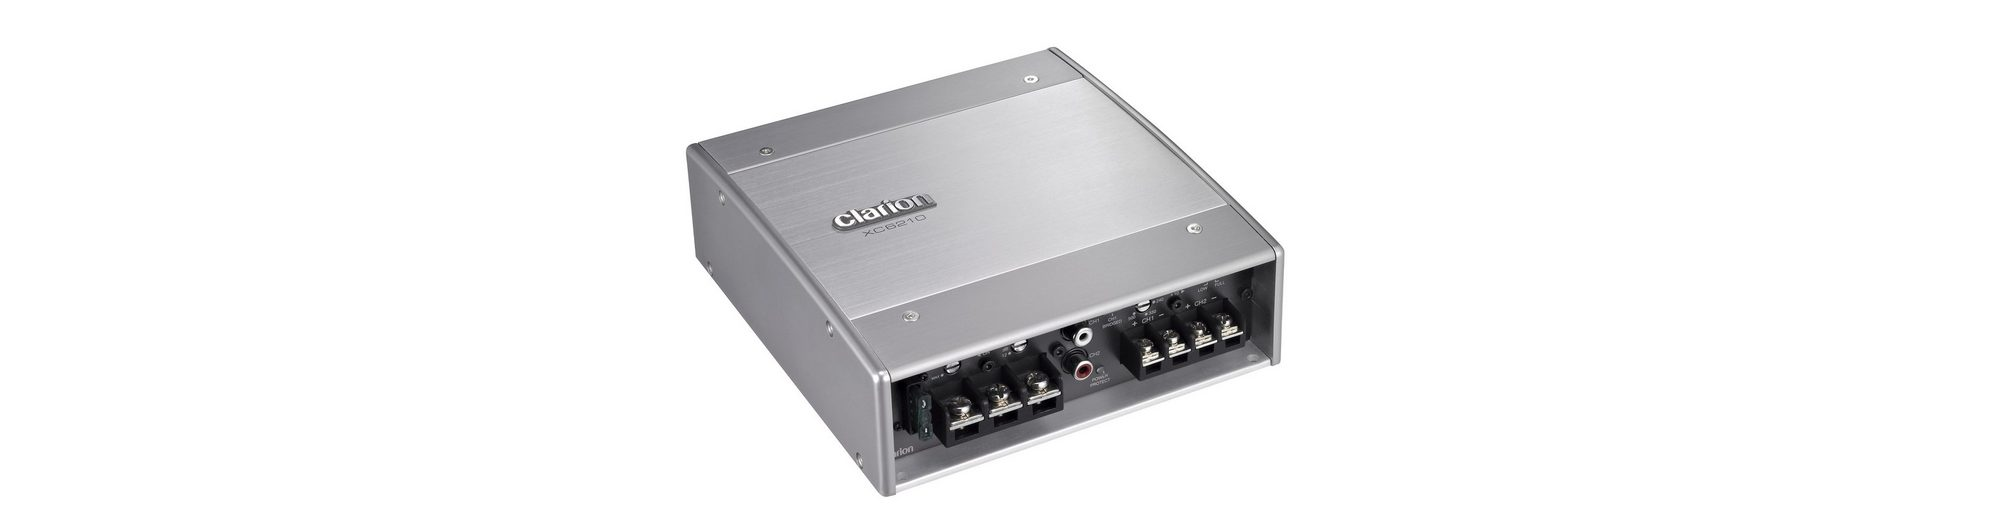 Clarion 2-Kanal Marine Kompaktendstufe »XC6210«